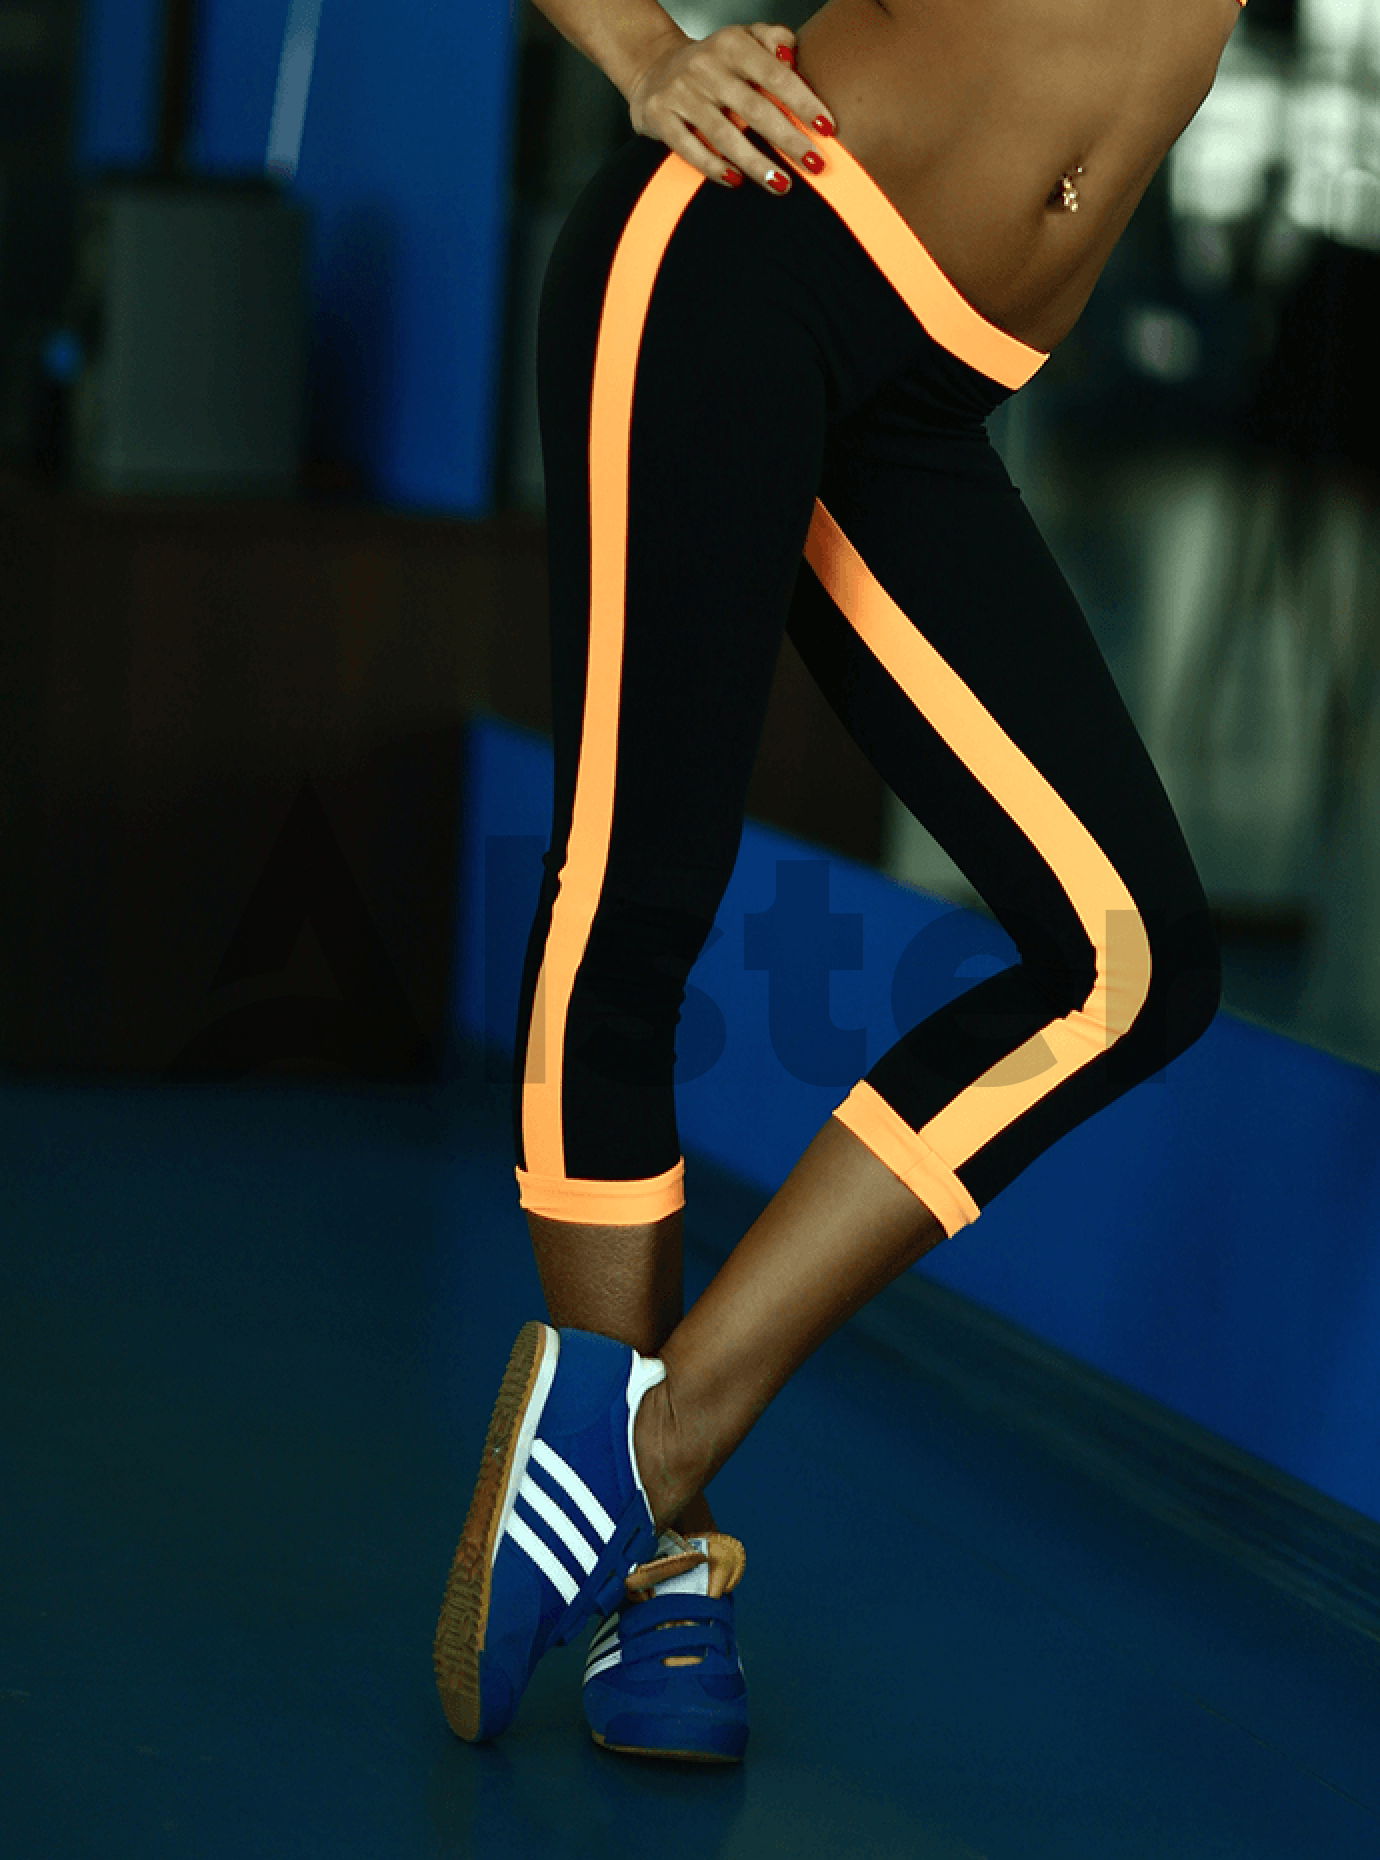 Бриджи женские Low Rise Orange Серый S (01-F171015): фото - Alster.ua